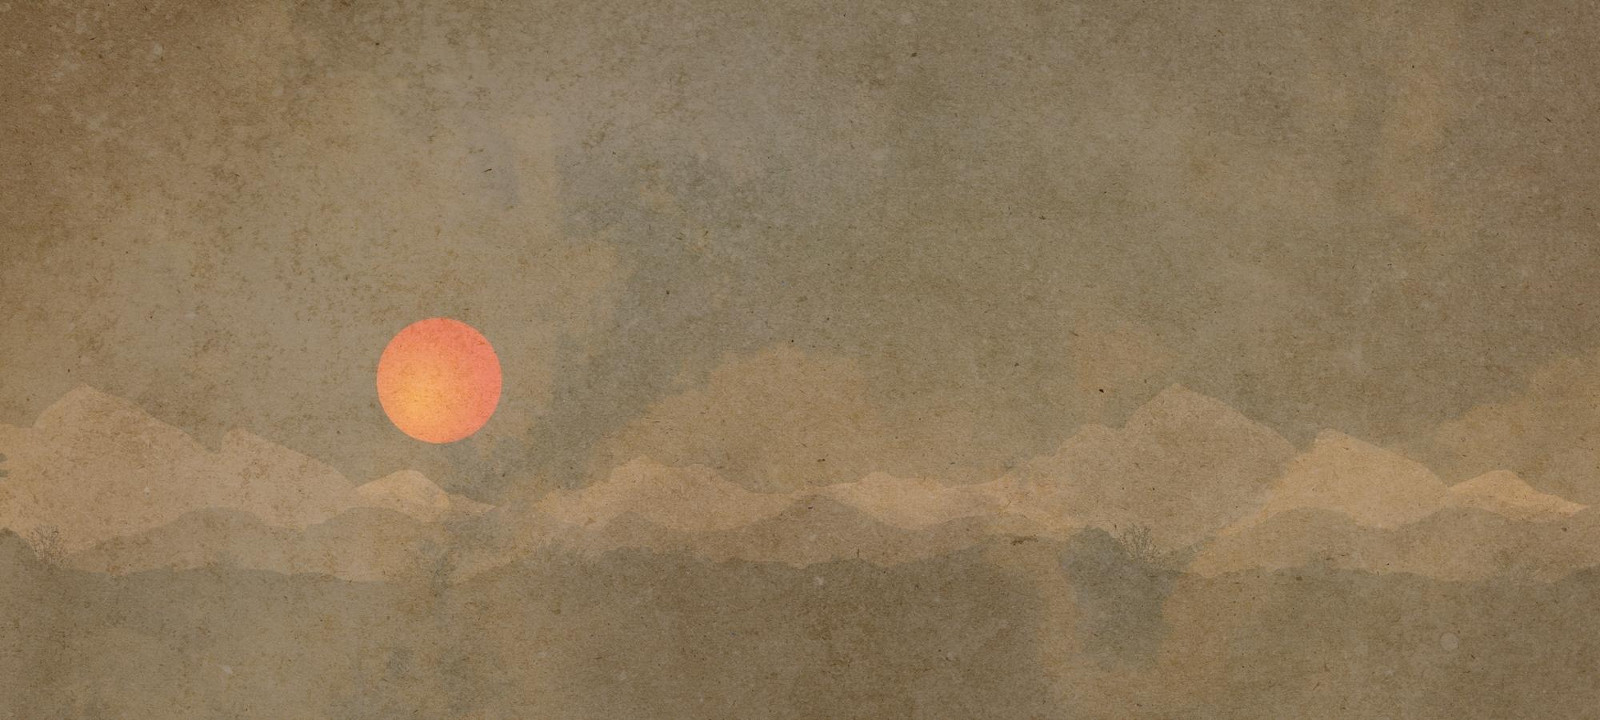 Resolving Faint Sun Paradoxes, Part 1